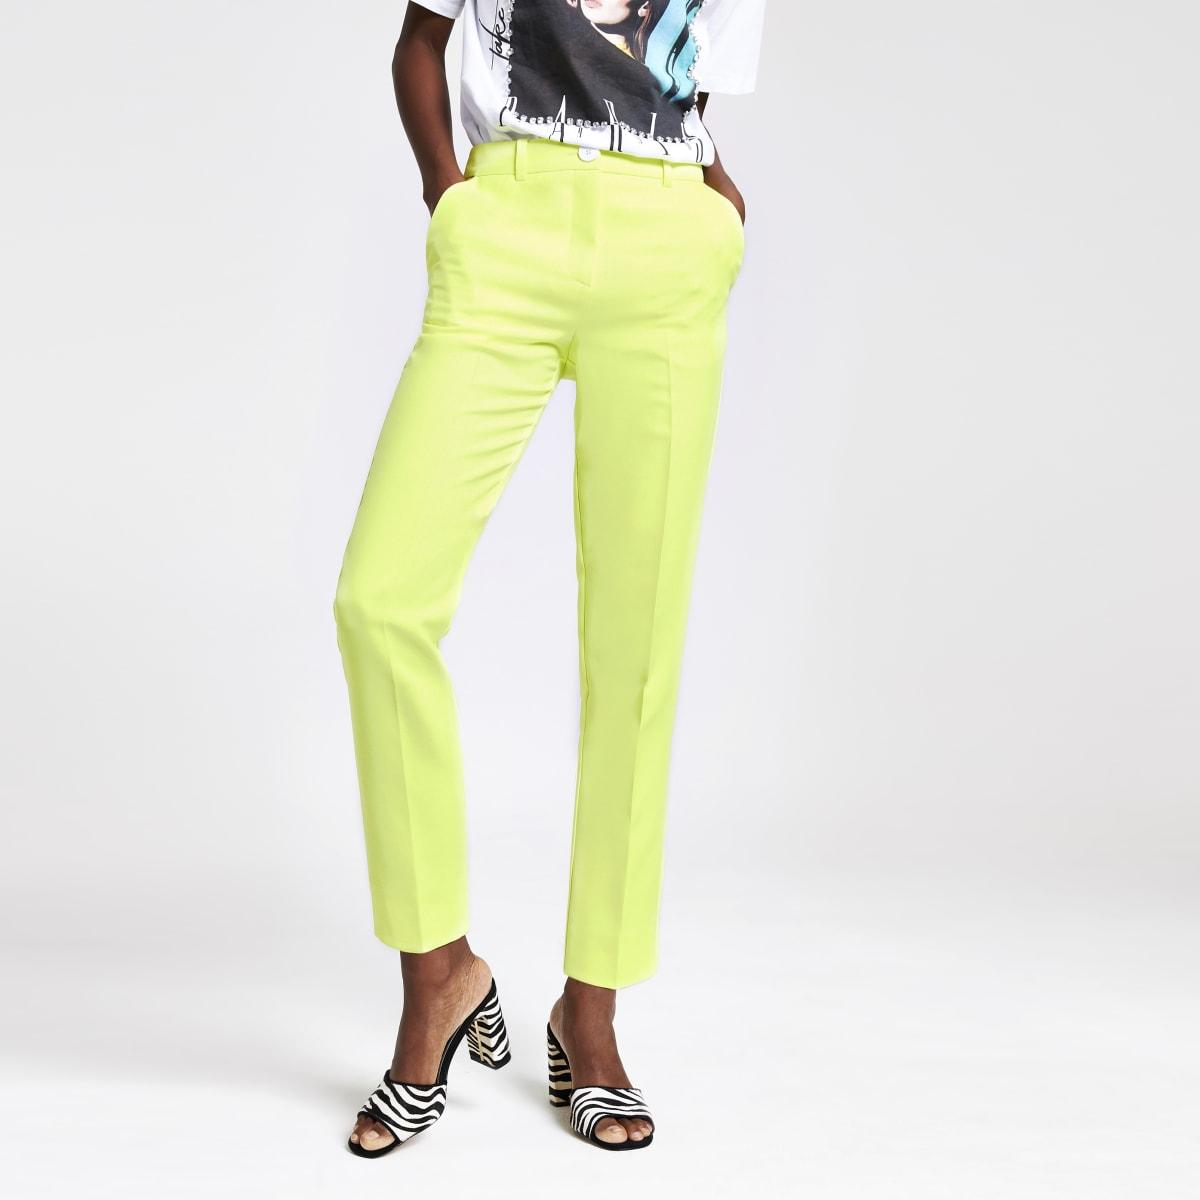 Lime cigarette pants